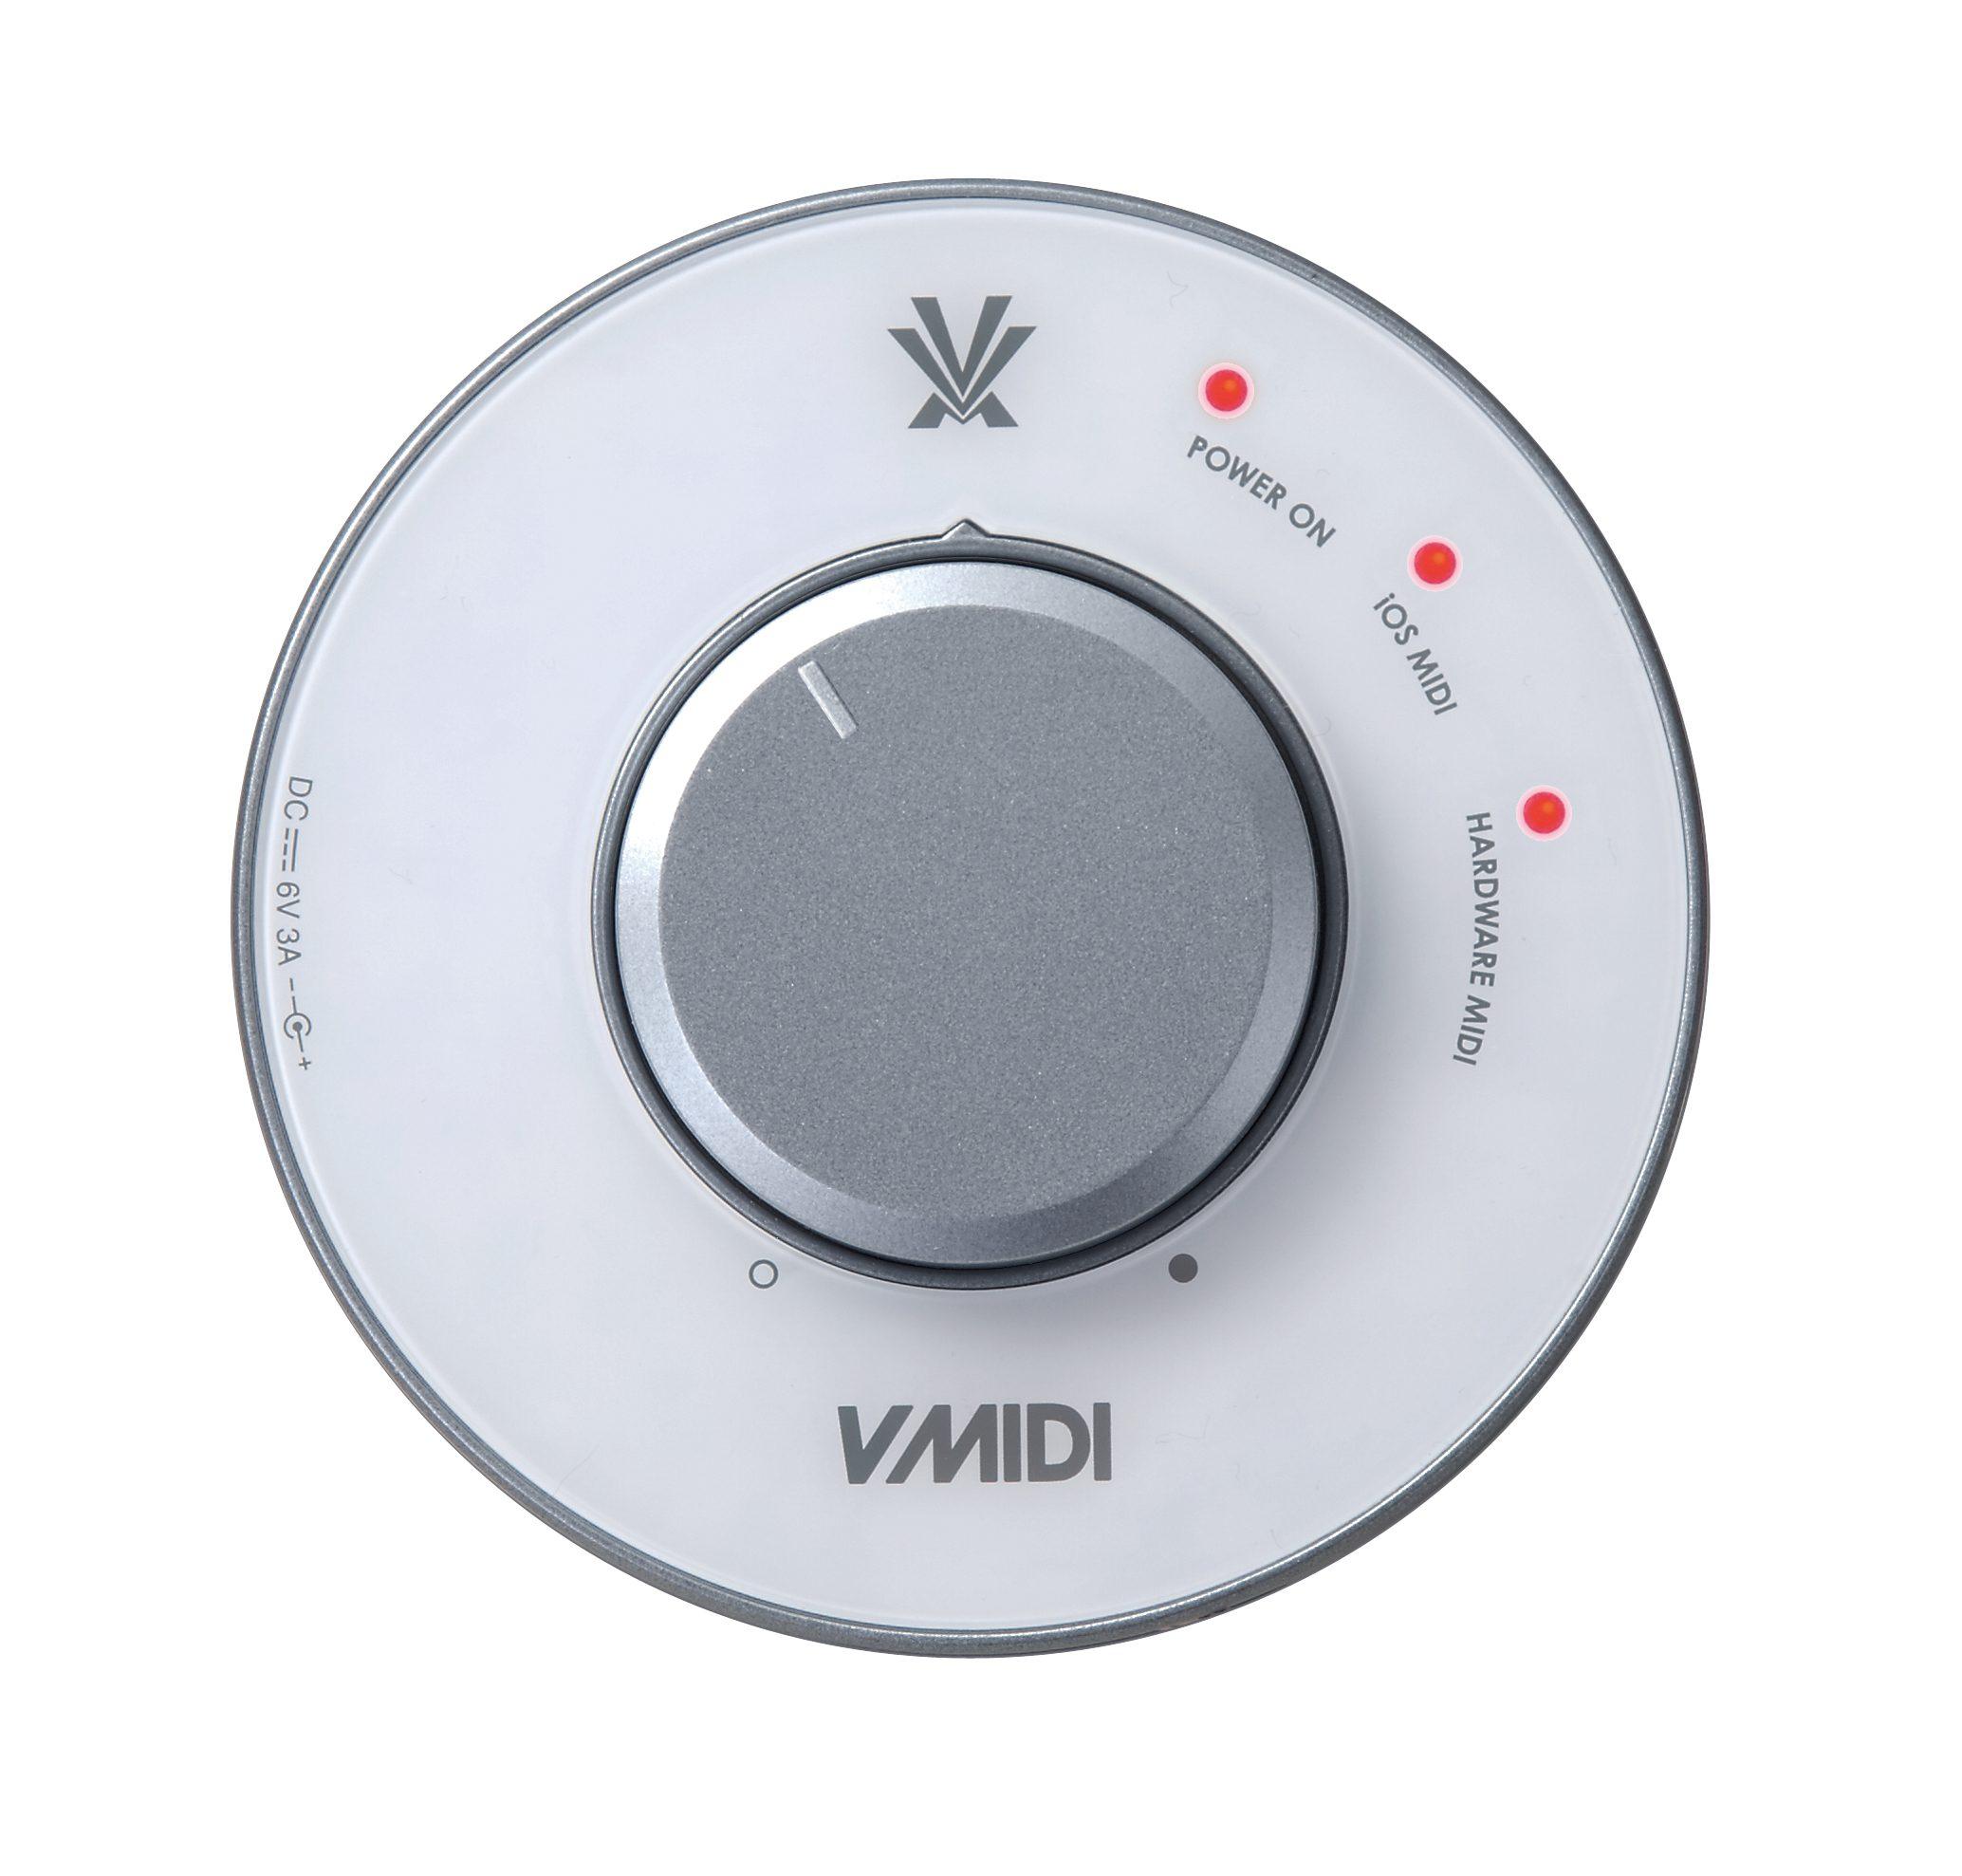 Vestax V-MIDI - Midi-Interface für iPhone, iPad und iPod TouchVestax V-MIDI - Midi-Interface for iPhone, iPad und iPod Touch